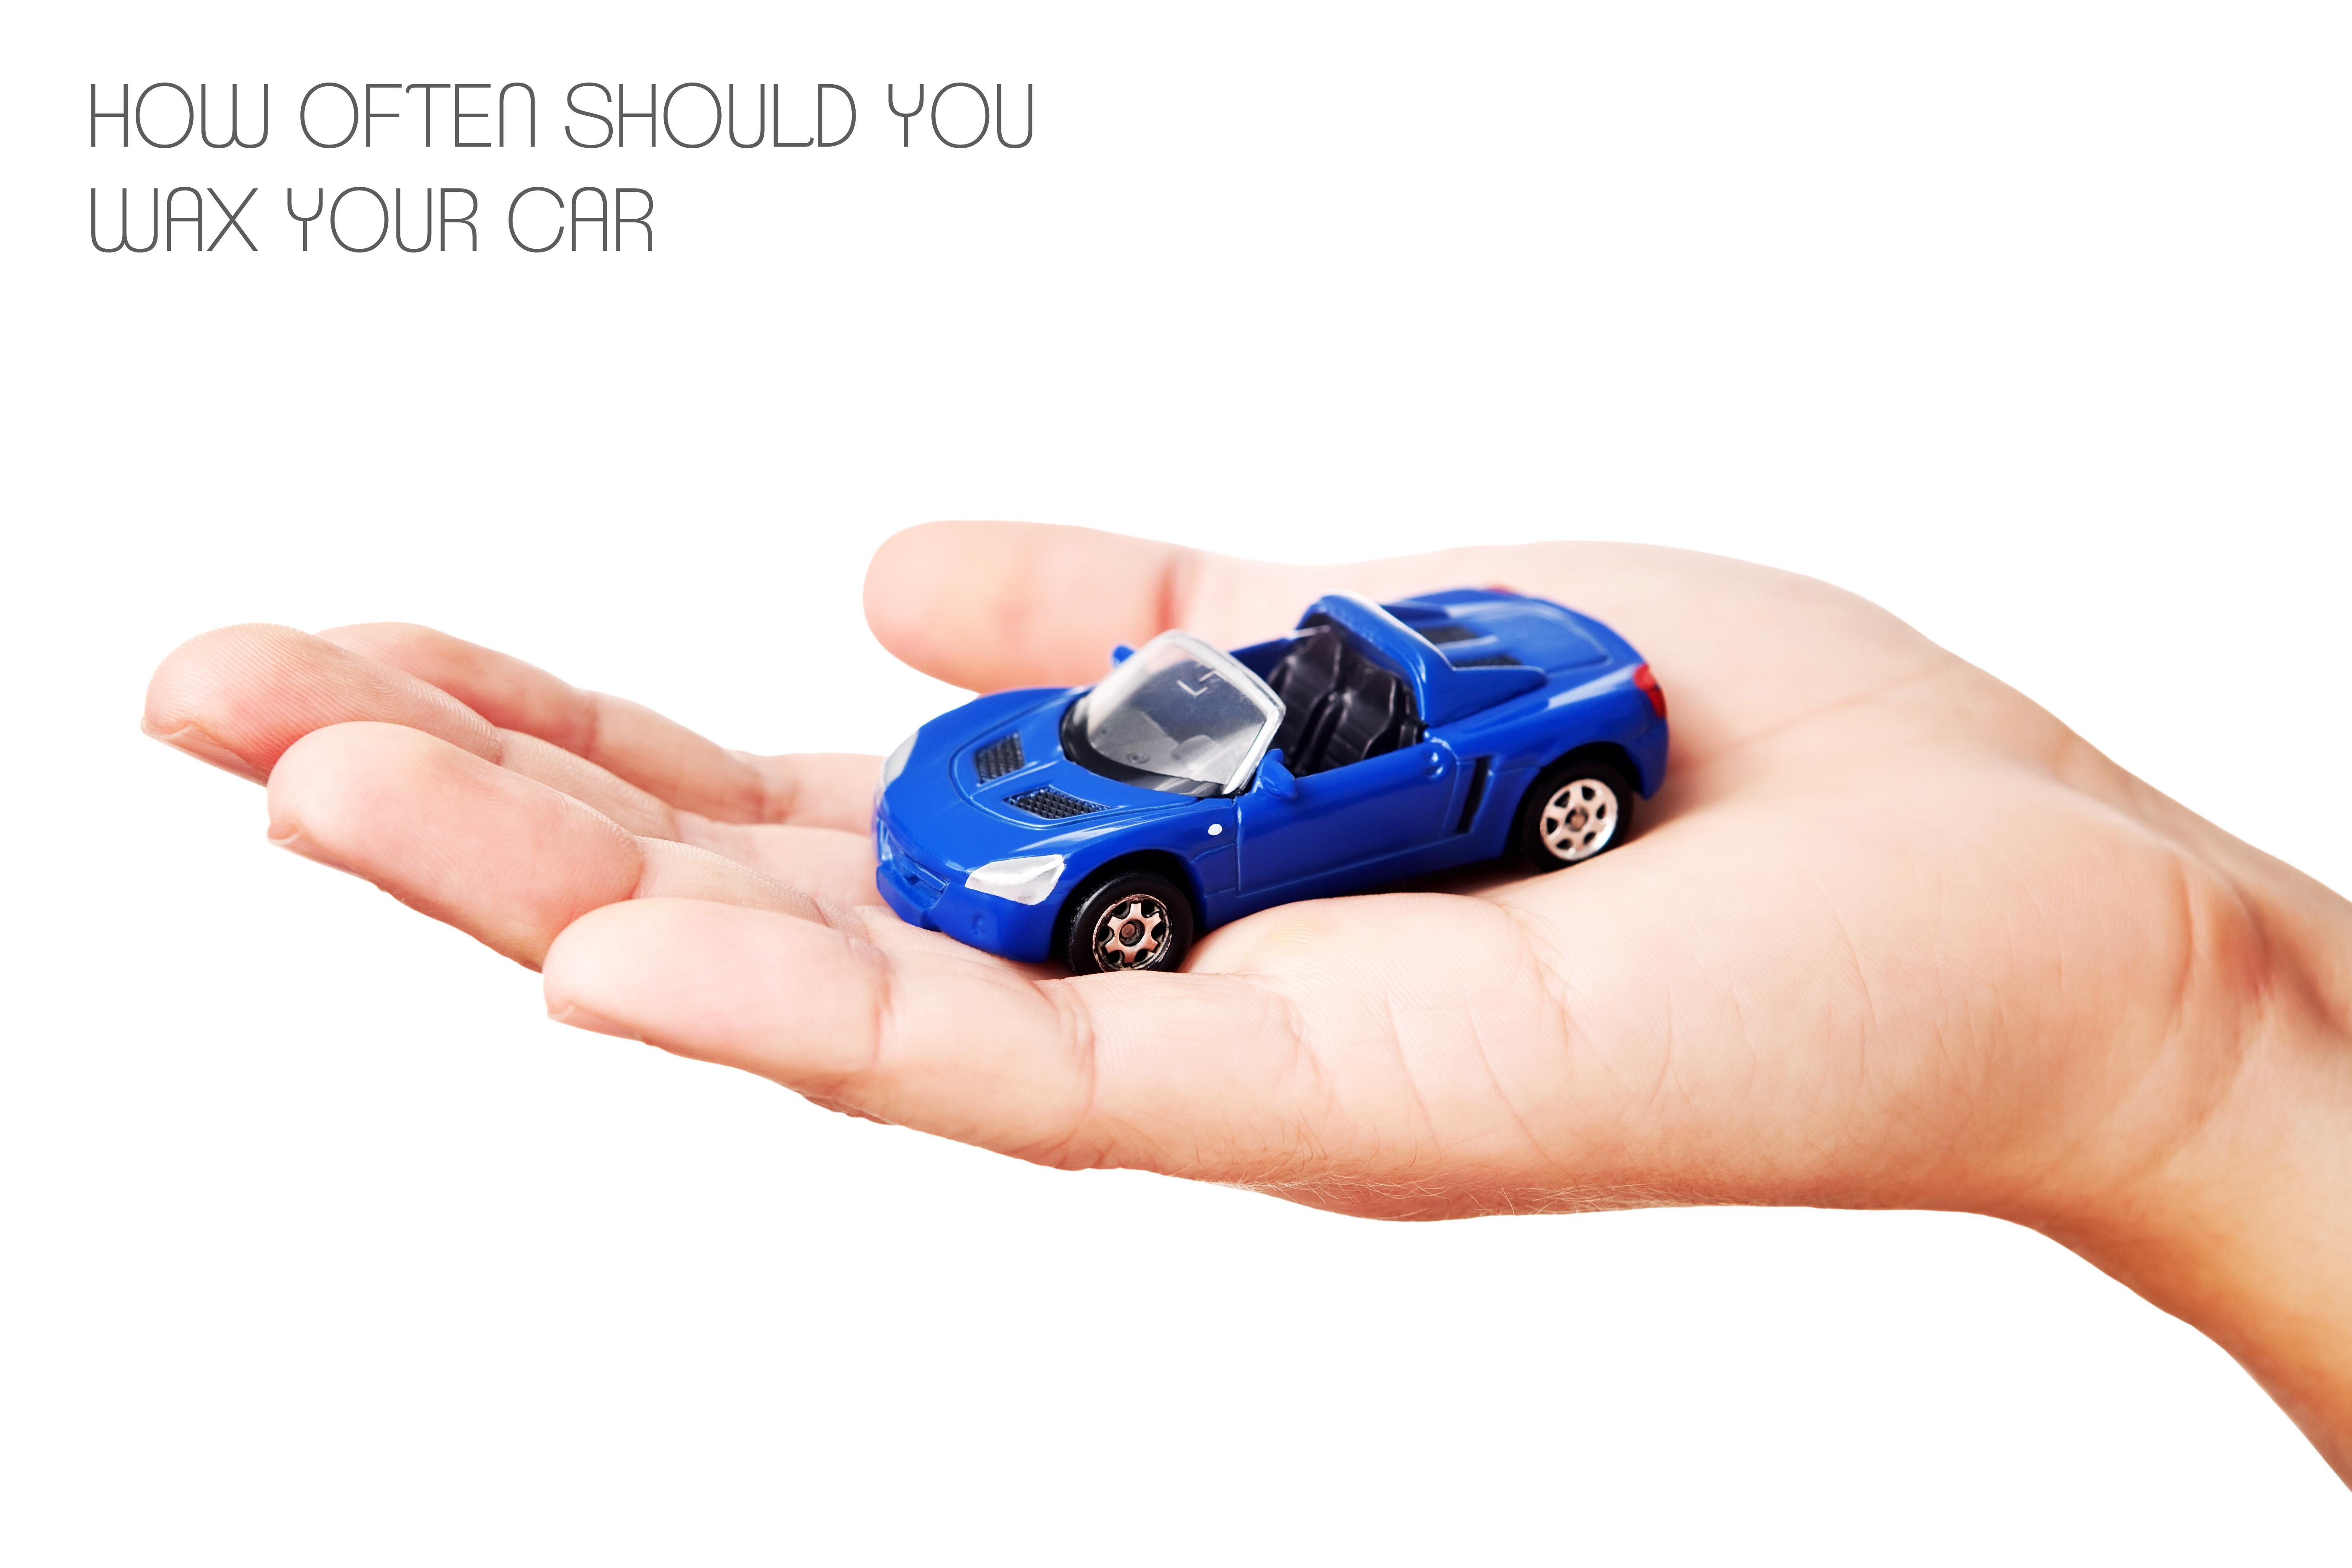 Can I Wax My Car Every Week